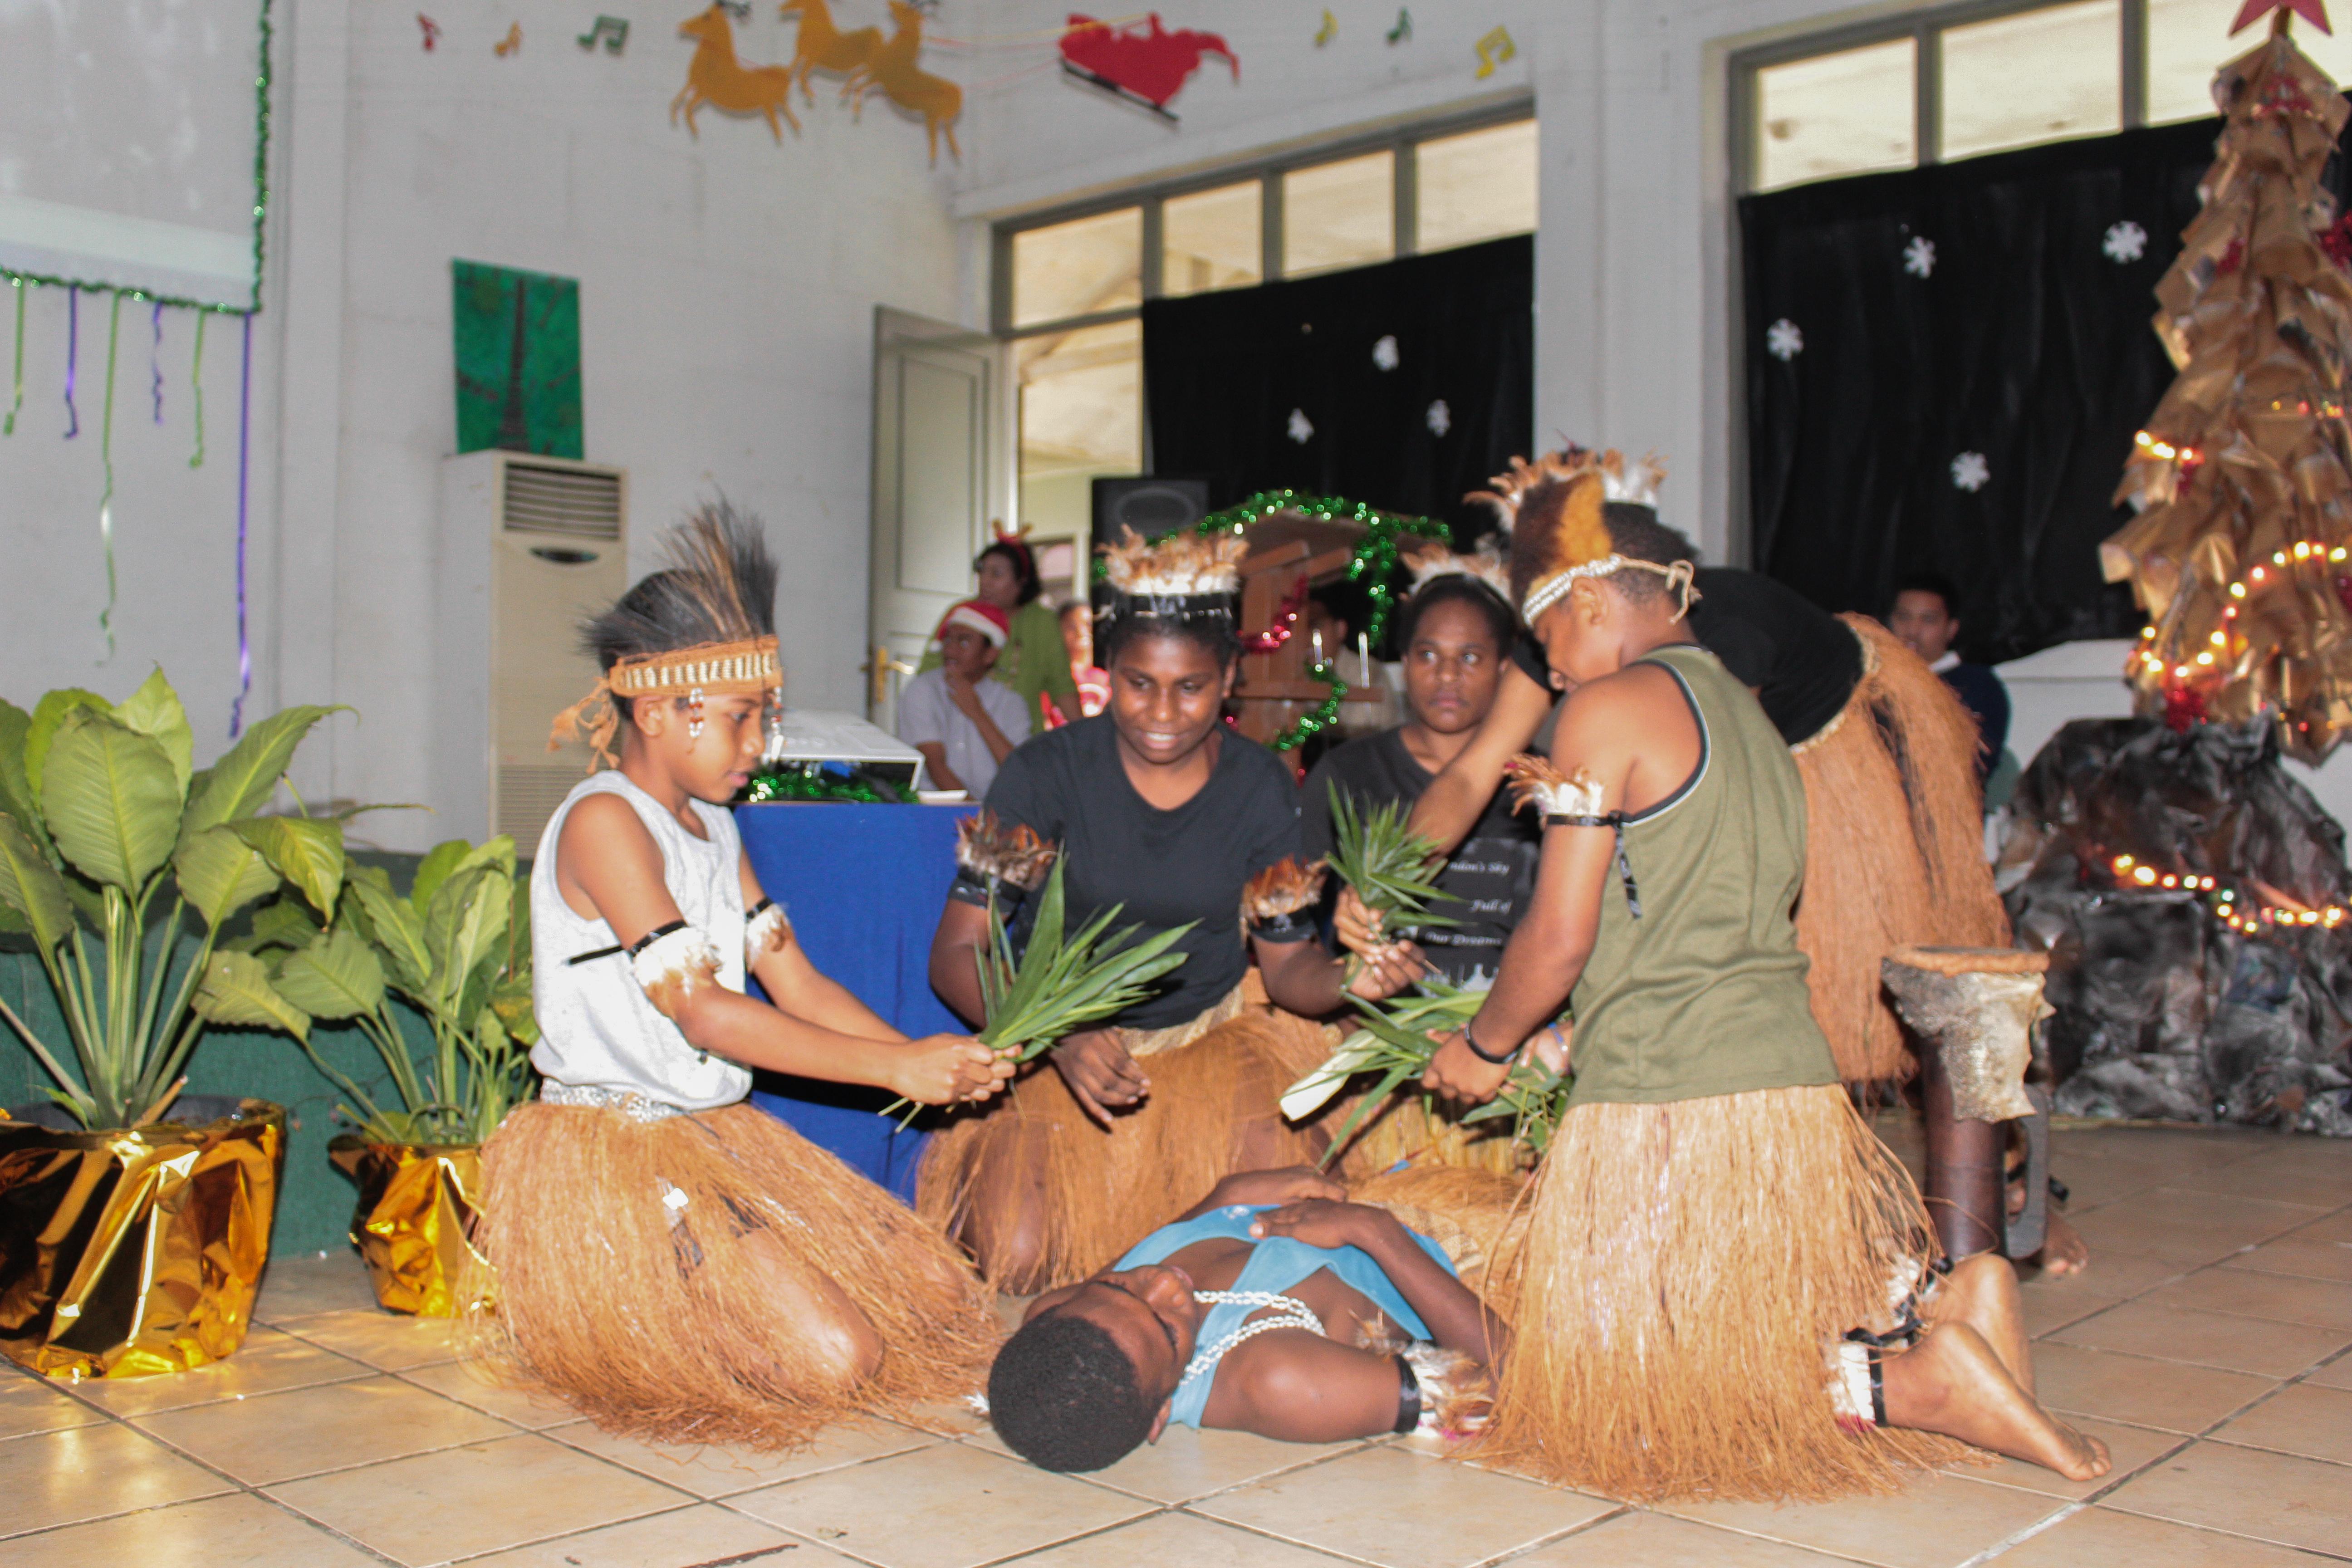 Sekolah anak inodoneia-Natal-sekolah papua-natal 2016-sekolah anak papua-perayaan natal papua-perayaan natal anak papua-penyelaaan lilin natal papua-SAI-sekolah untuk anak papua